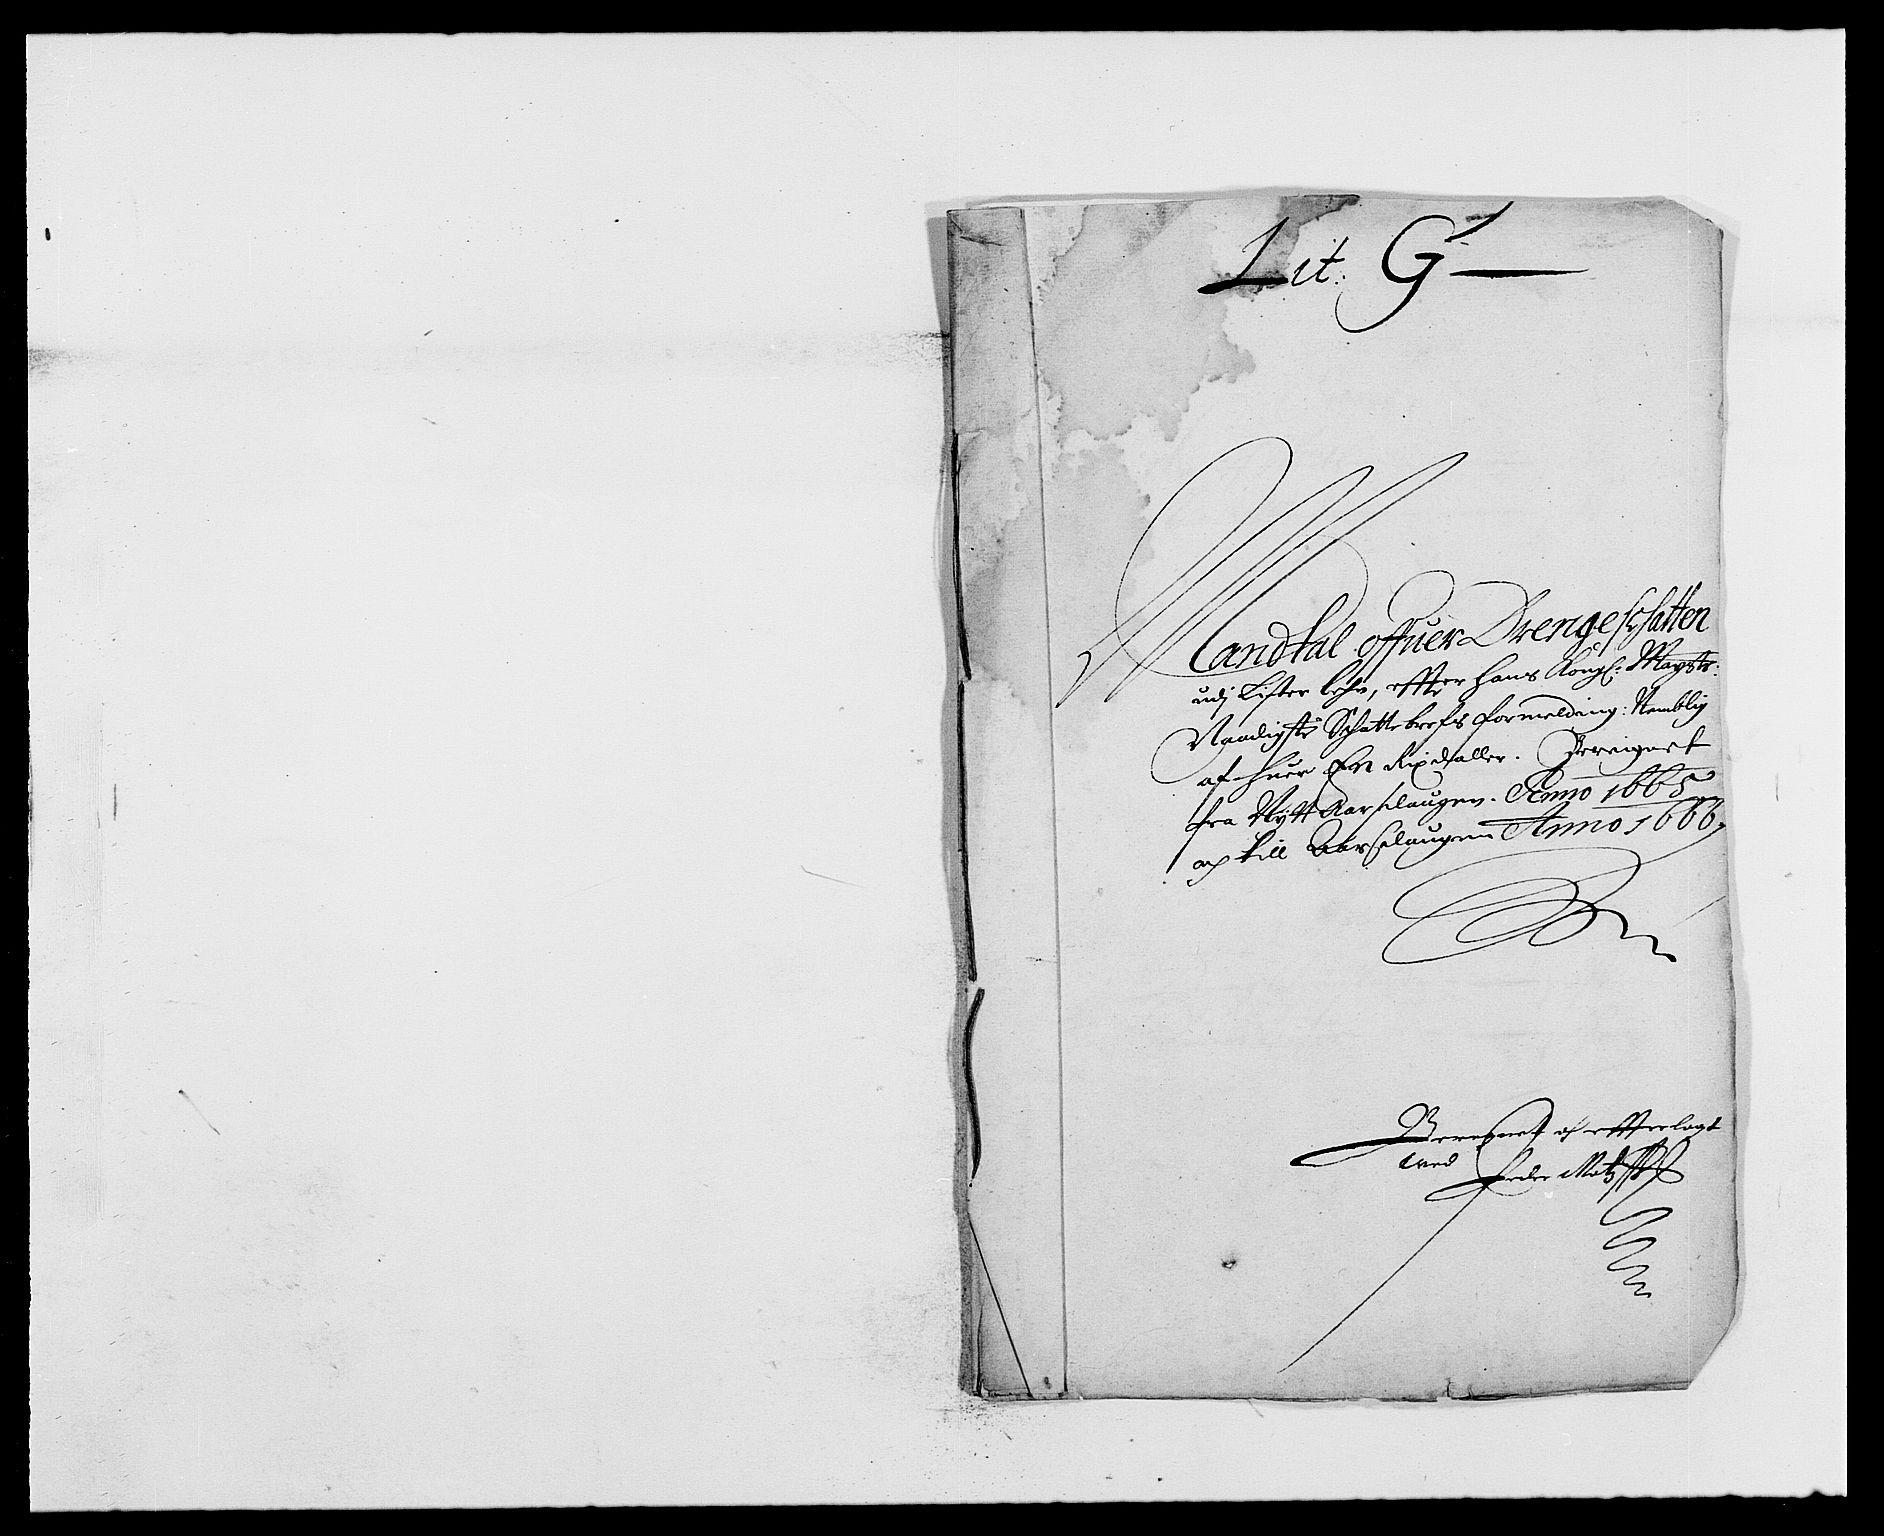 RA, Rentekammeret inntil 1814, Reviderte regnskaper, Fogderegnskap, R41/L2524: Fogderegnskap Lista, 1665-1668, s. 147